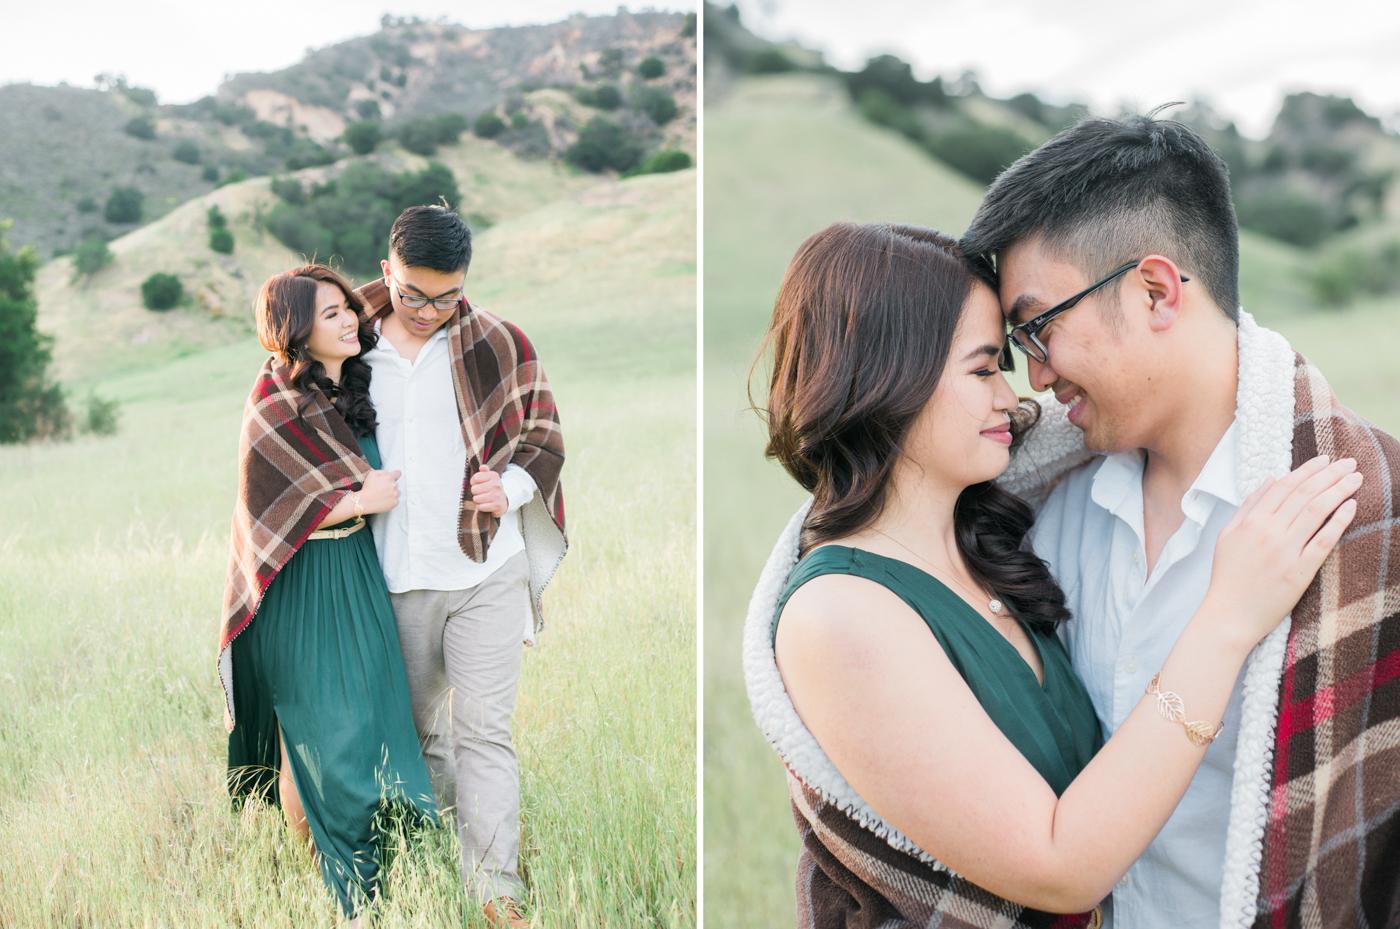 dianne&christian-malibu-creek-state-park-engagement-session-photography-los-angeles-based-wedding-photographer-7.jpg